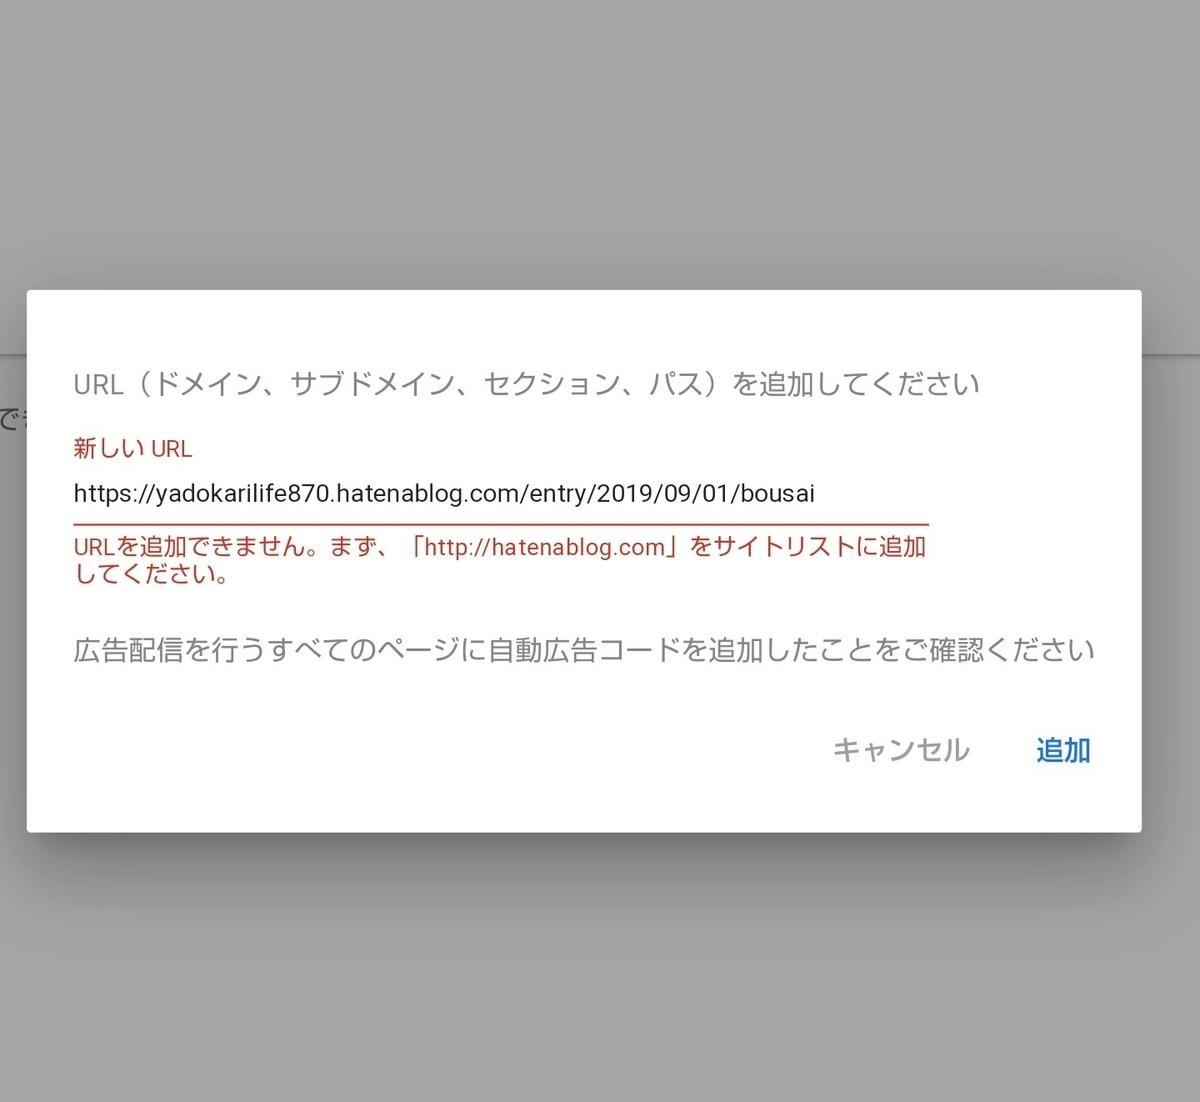 f:id:yadokarilife870:20190908113547j:plain